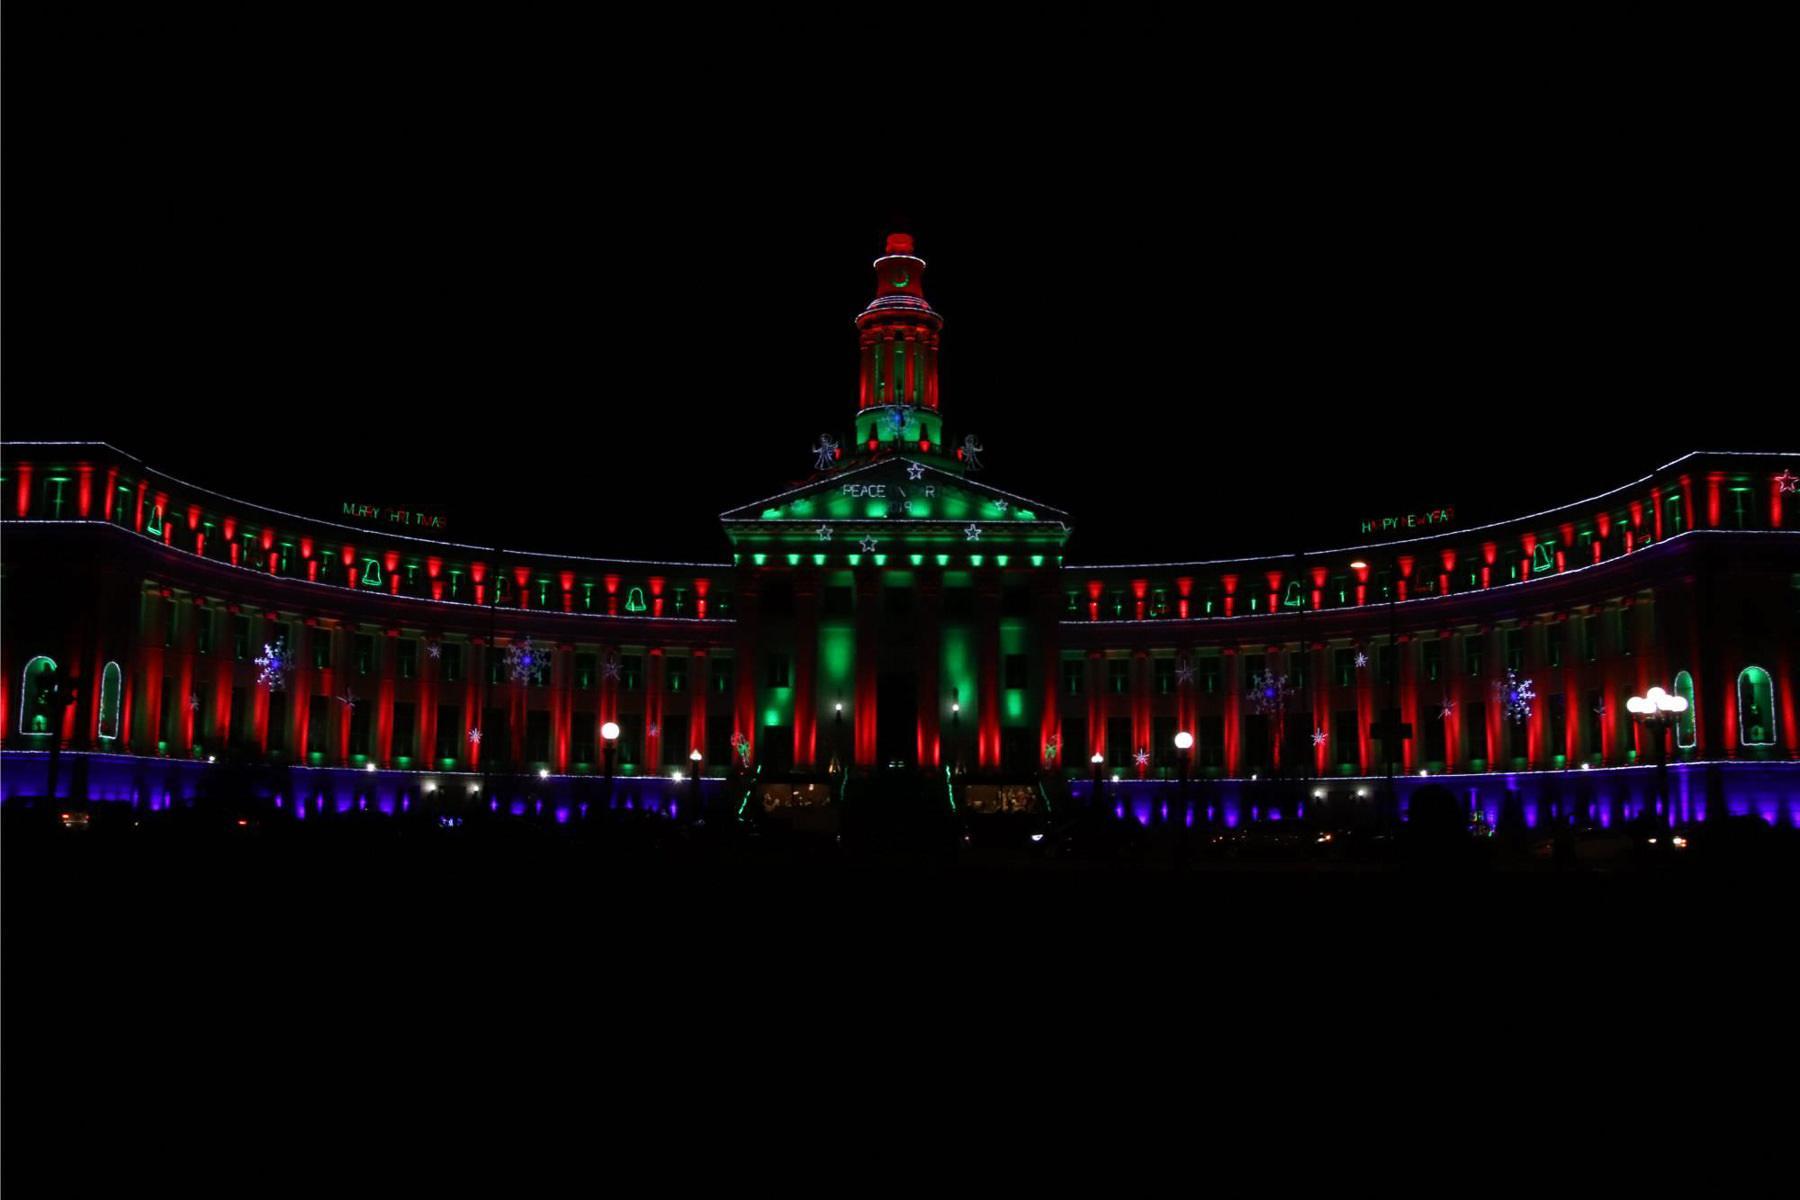 Kraft_Diane_Holiday-Lights_1